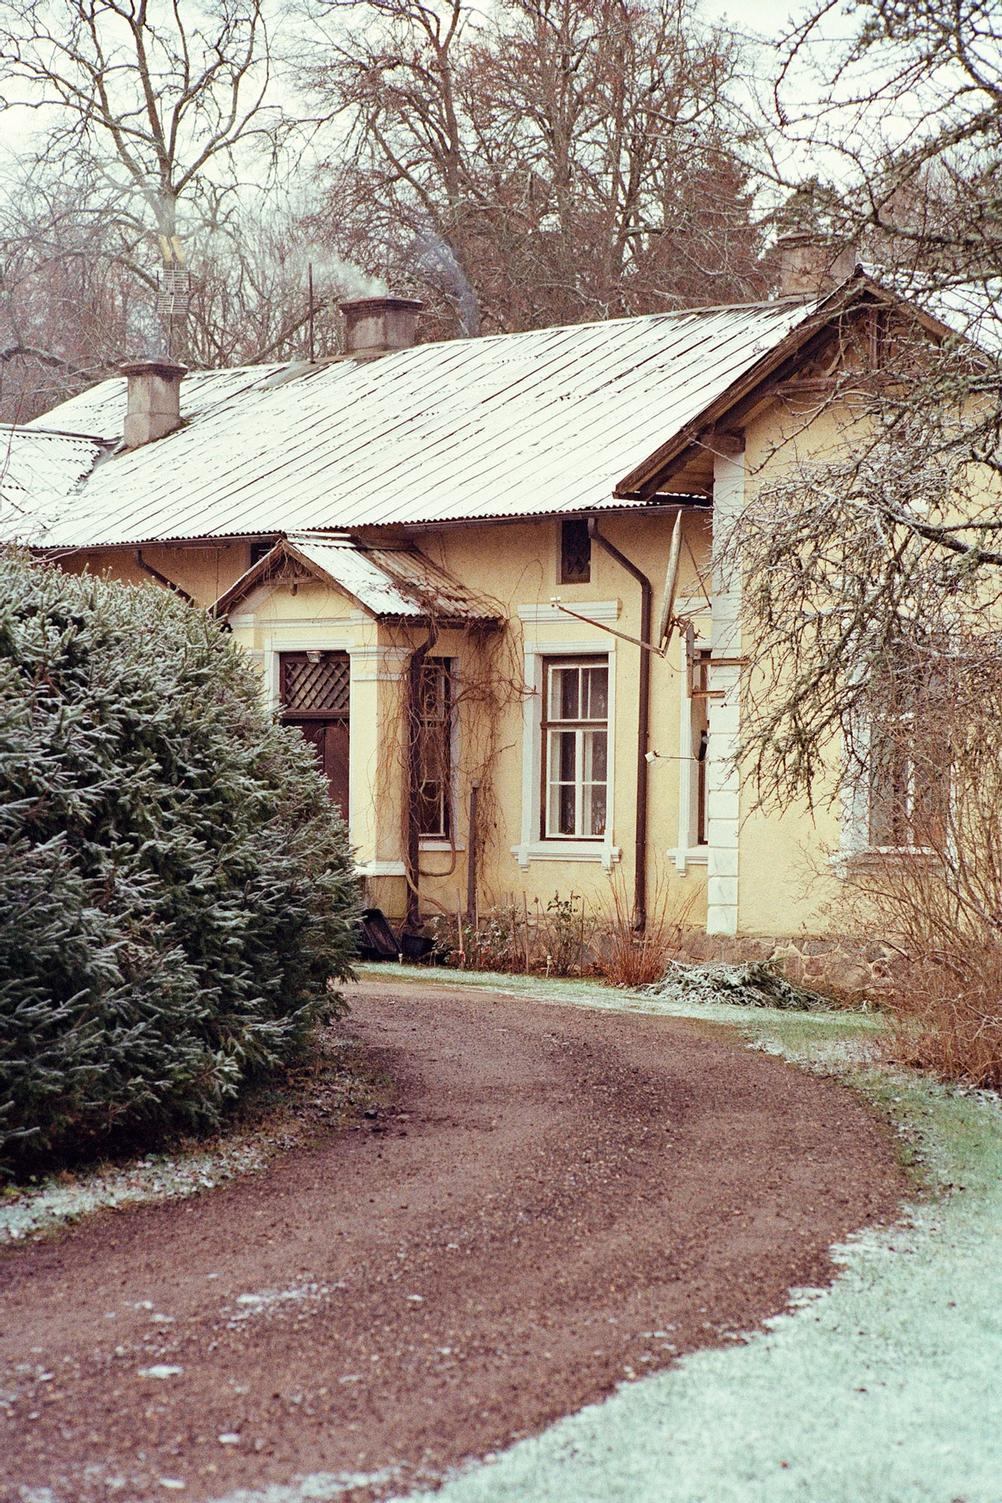 House slightly hiding behind bushes.